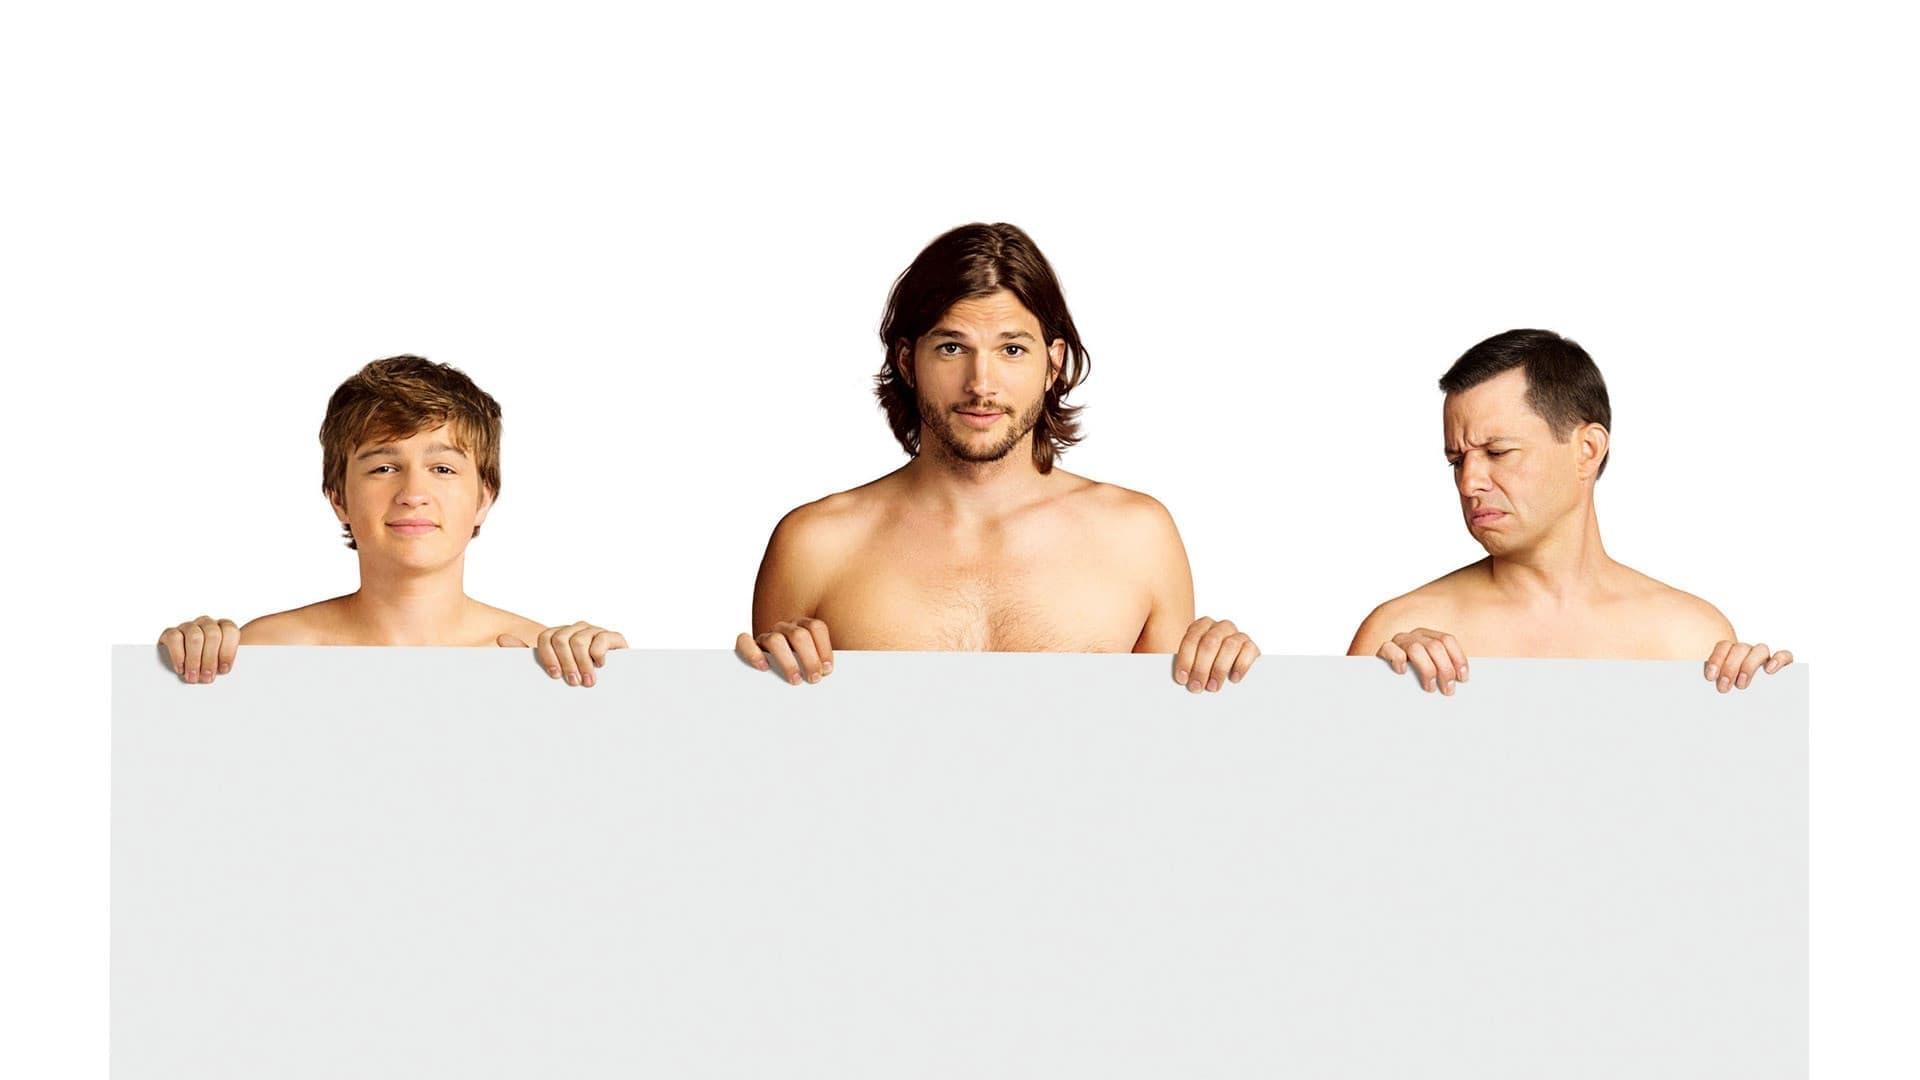 Two and a Half Men - Season 5